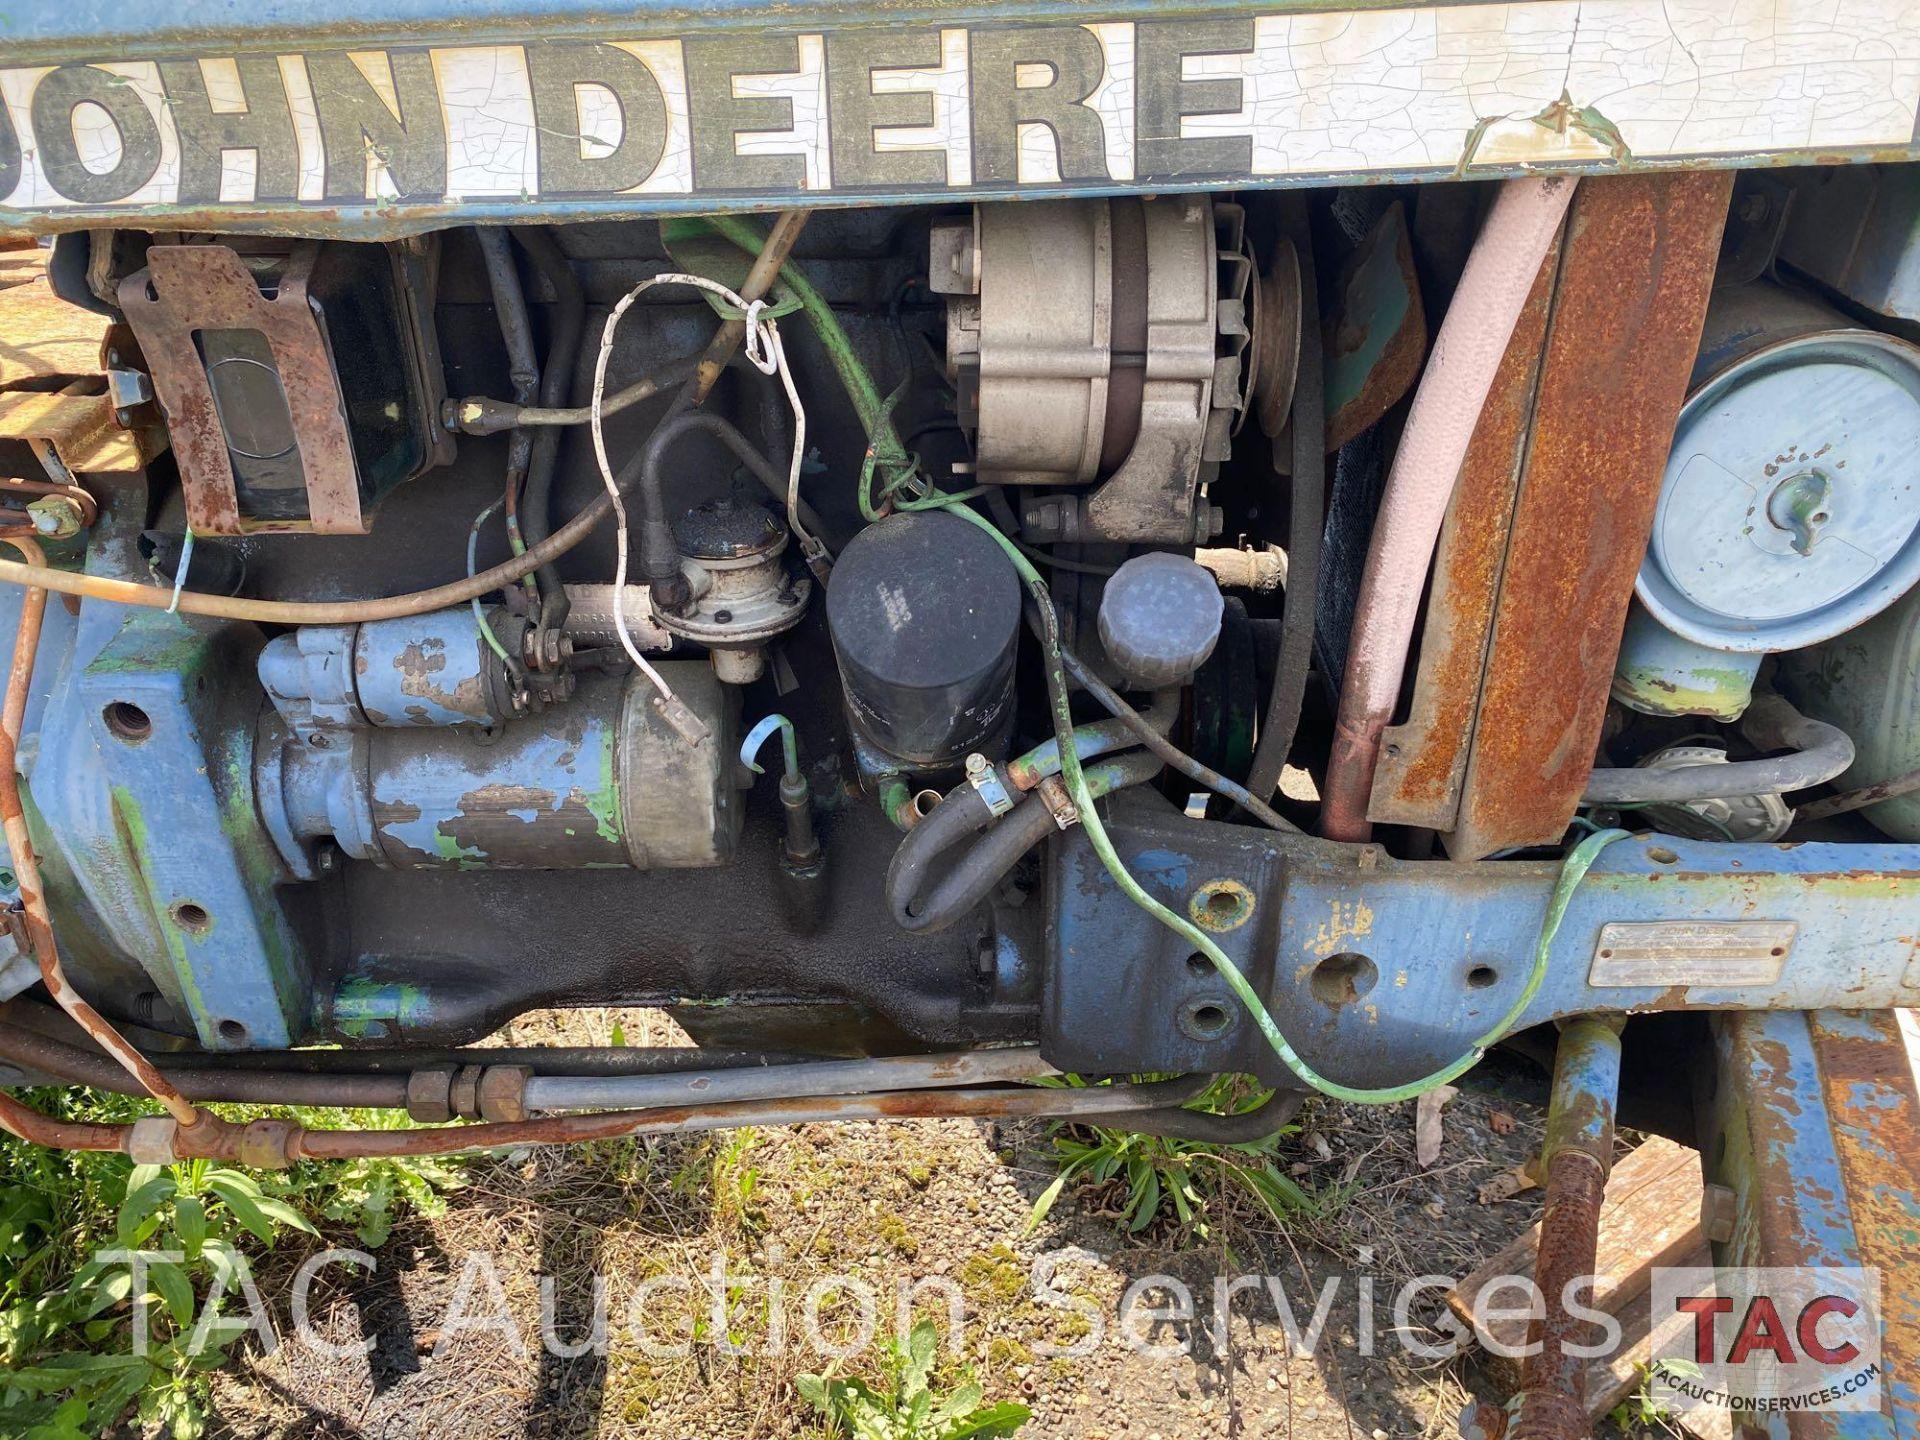 John Deere 2150 Farm Tractor - Image 6 of 34